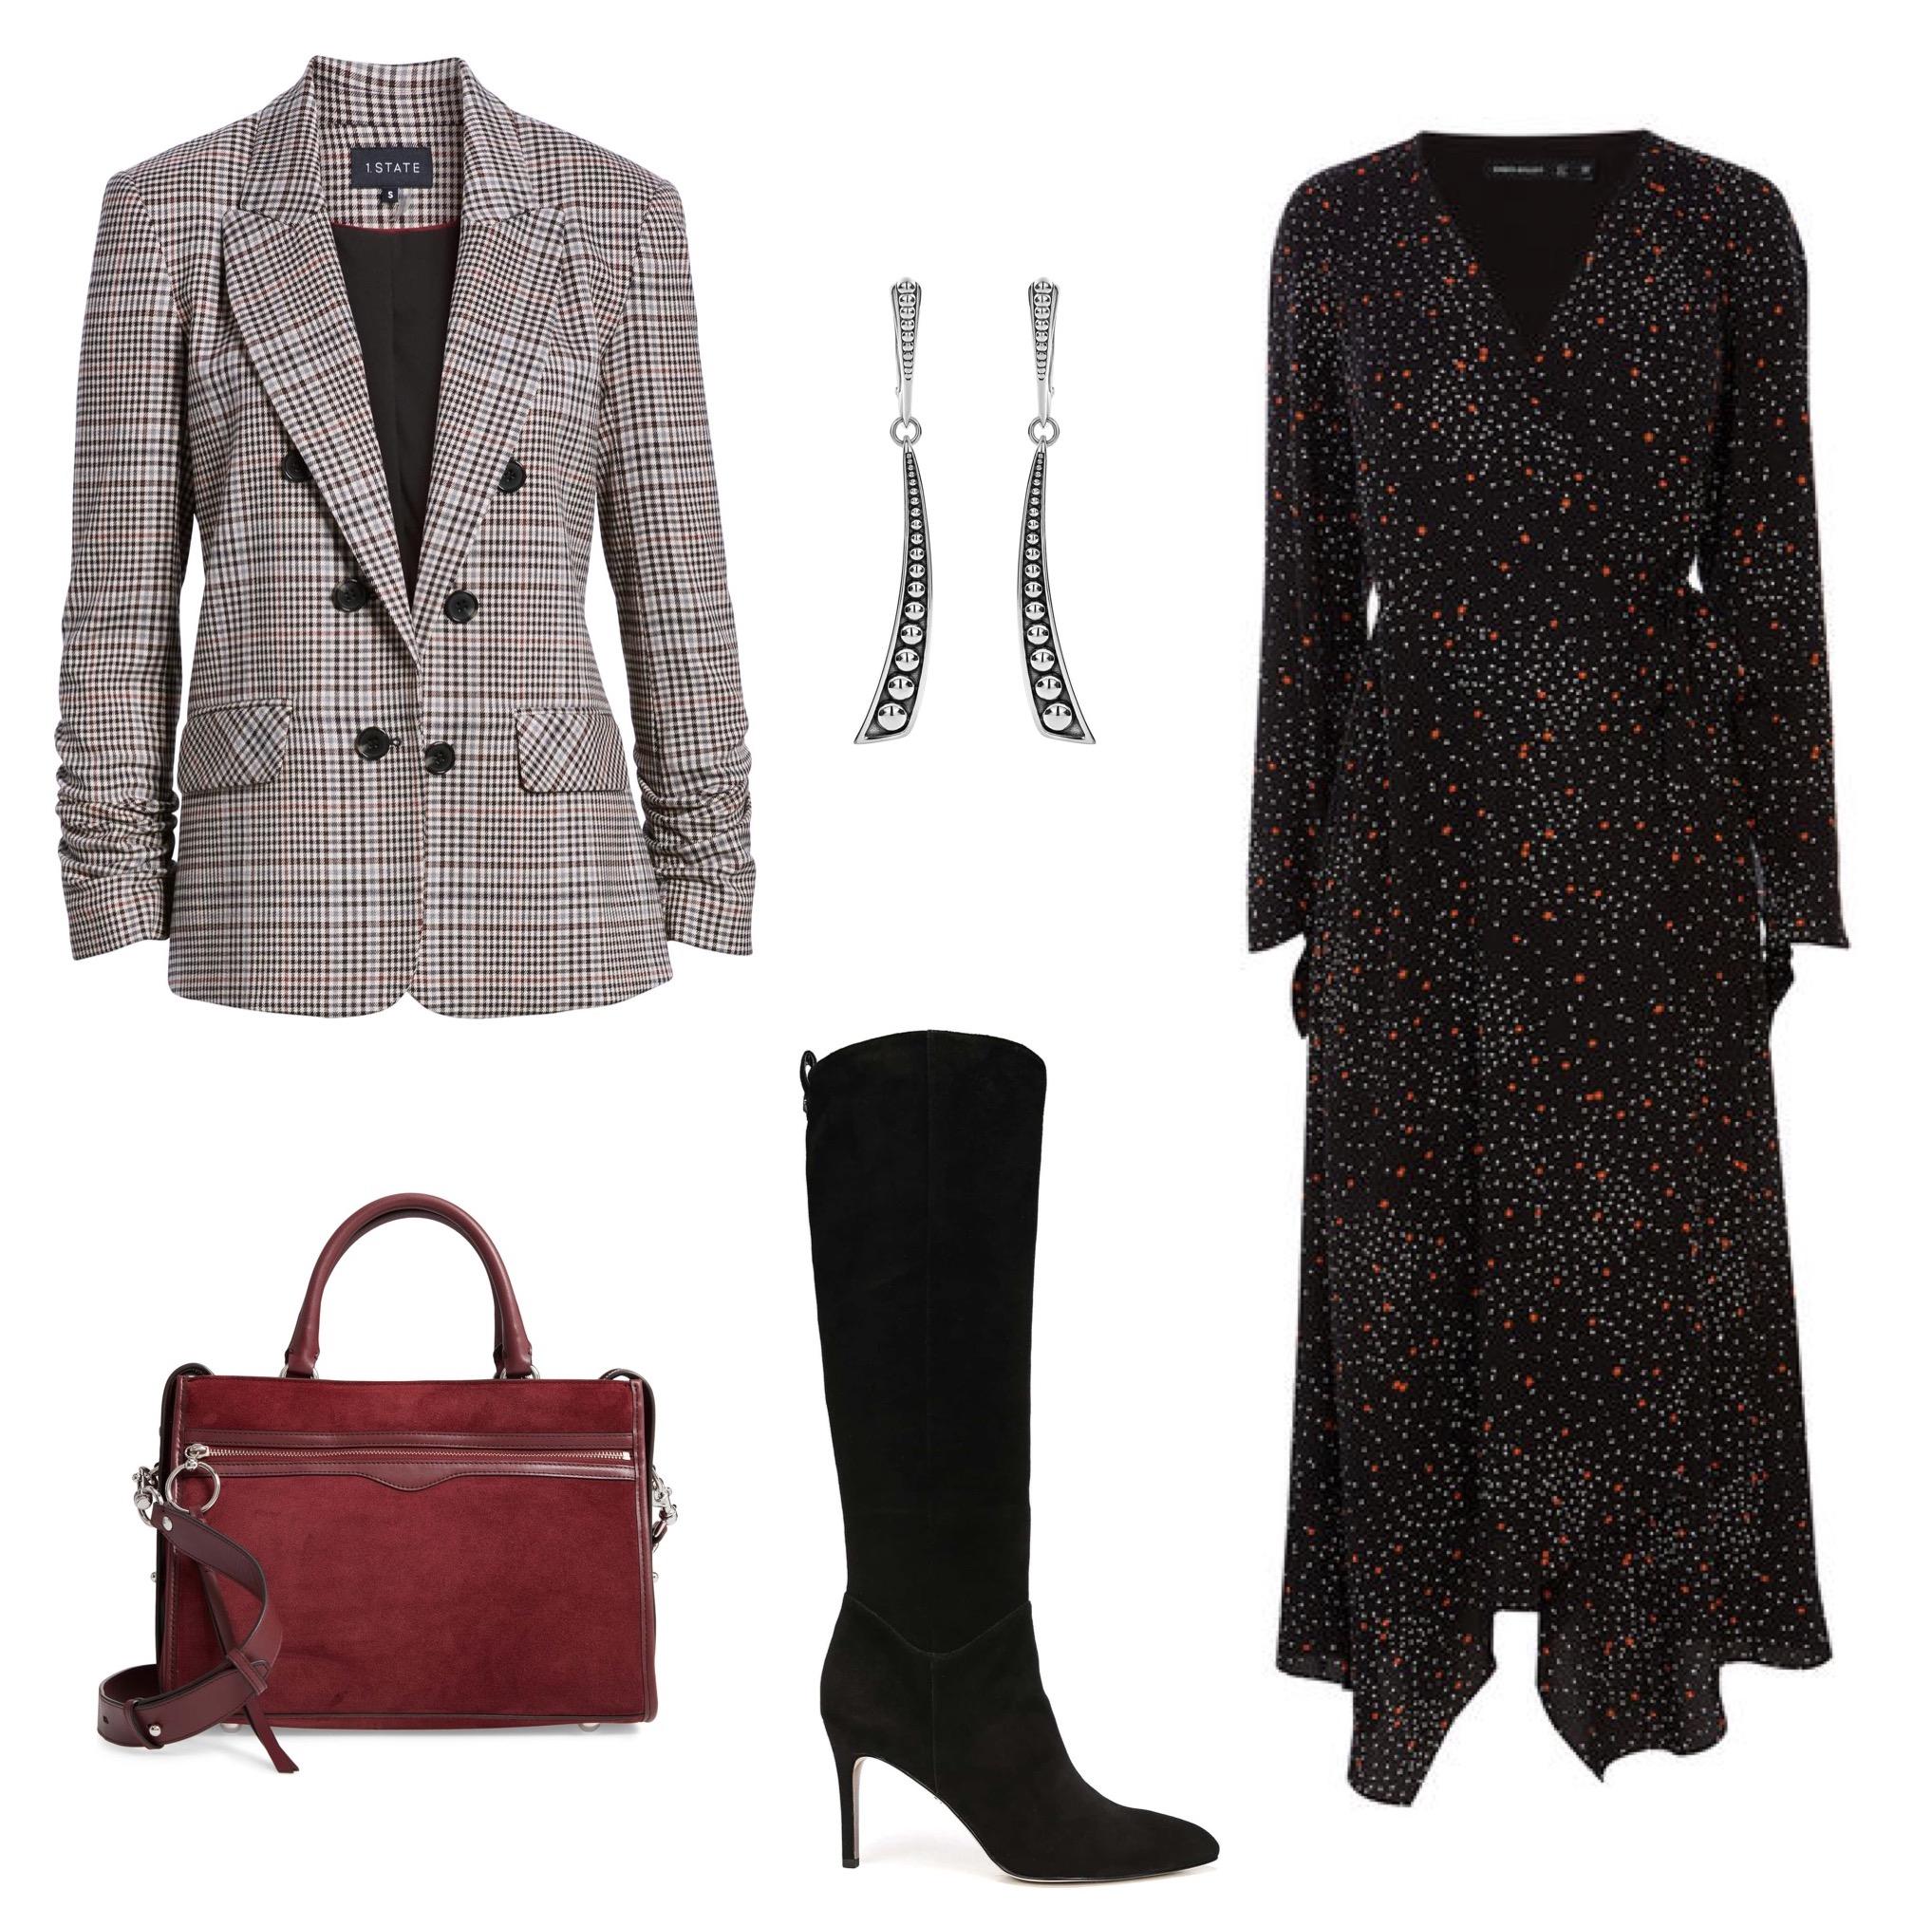 w:dress.jpeg